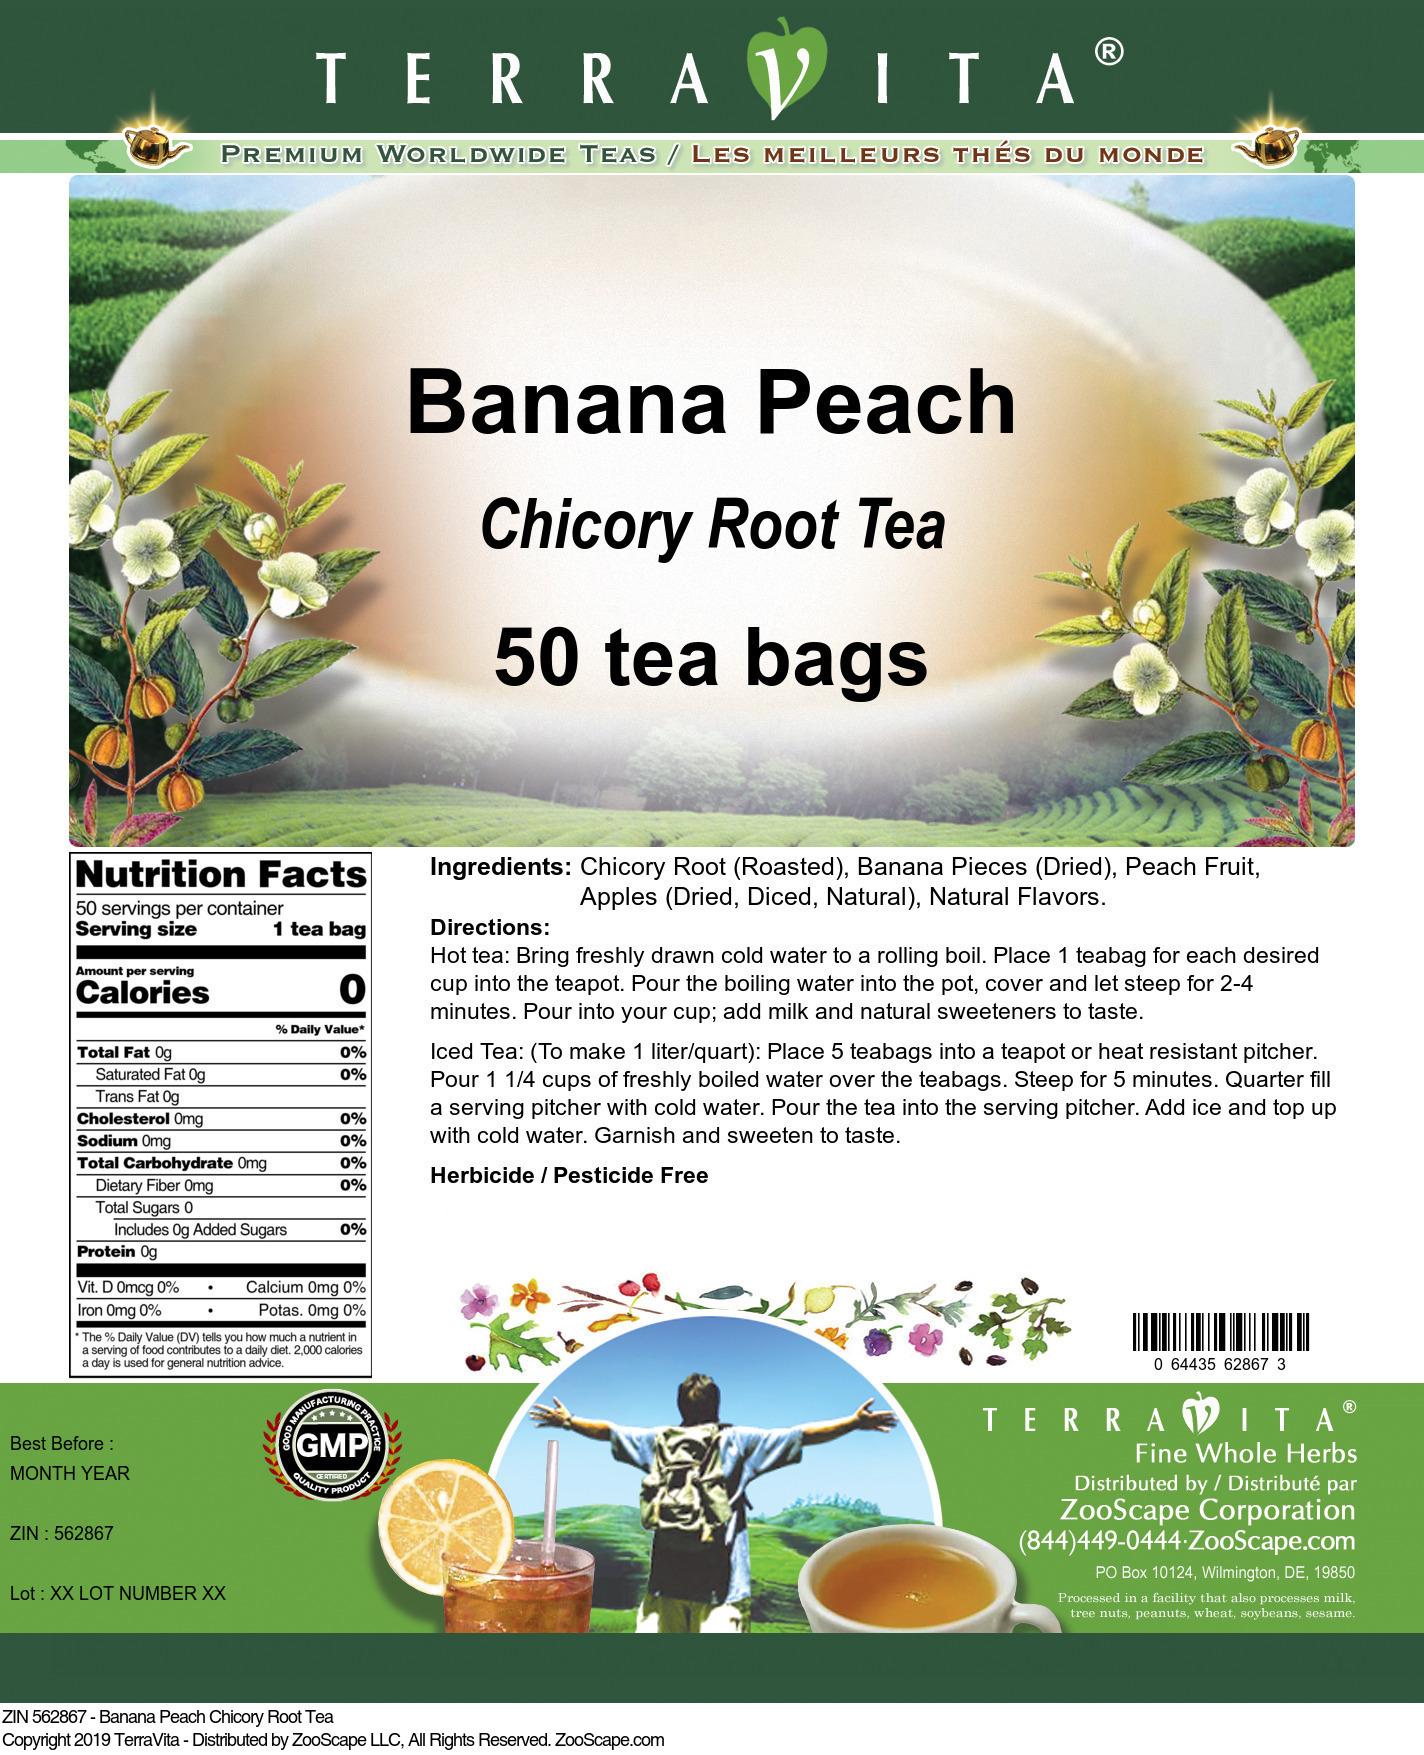 Banana Peach Chicory Root Tea